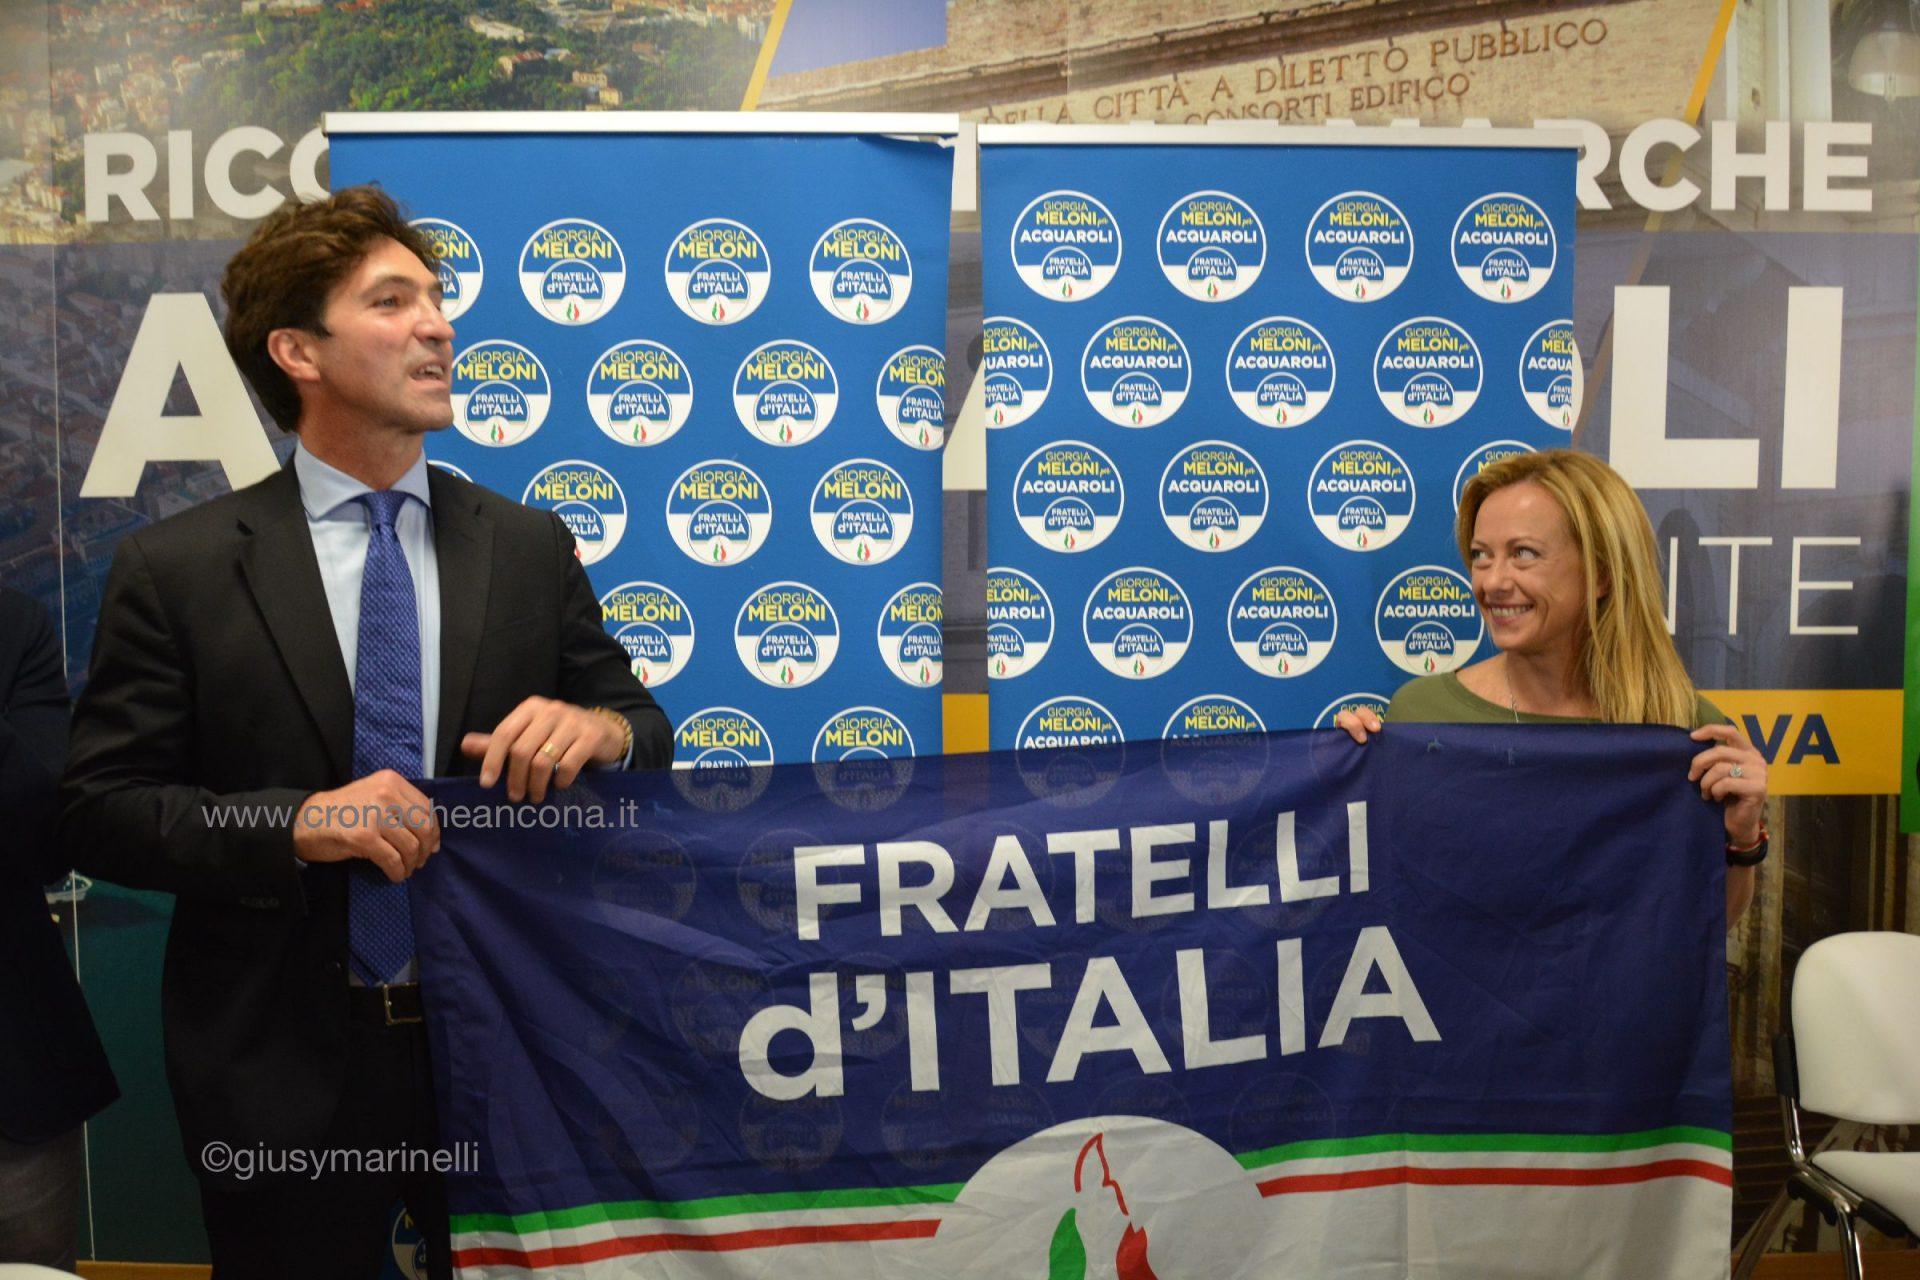 elezioni_regionali-Acquaroli-DSC_0380